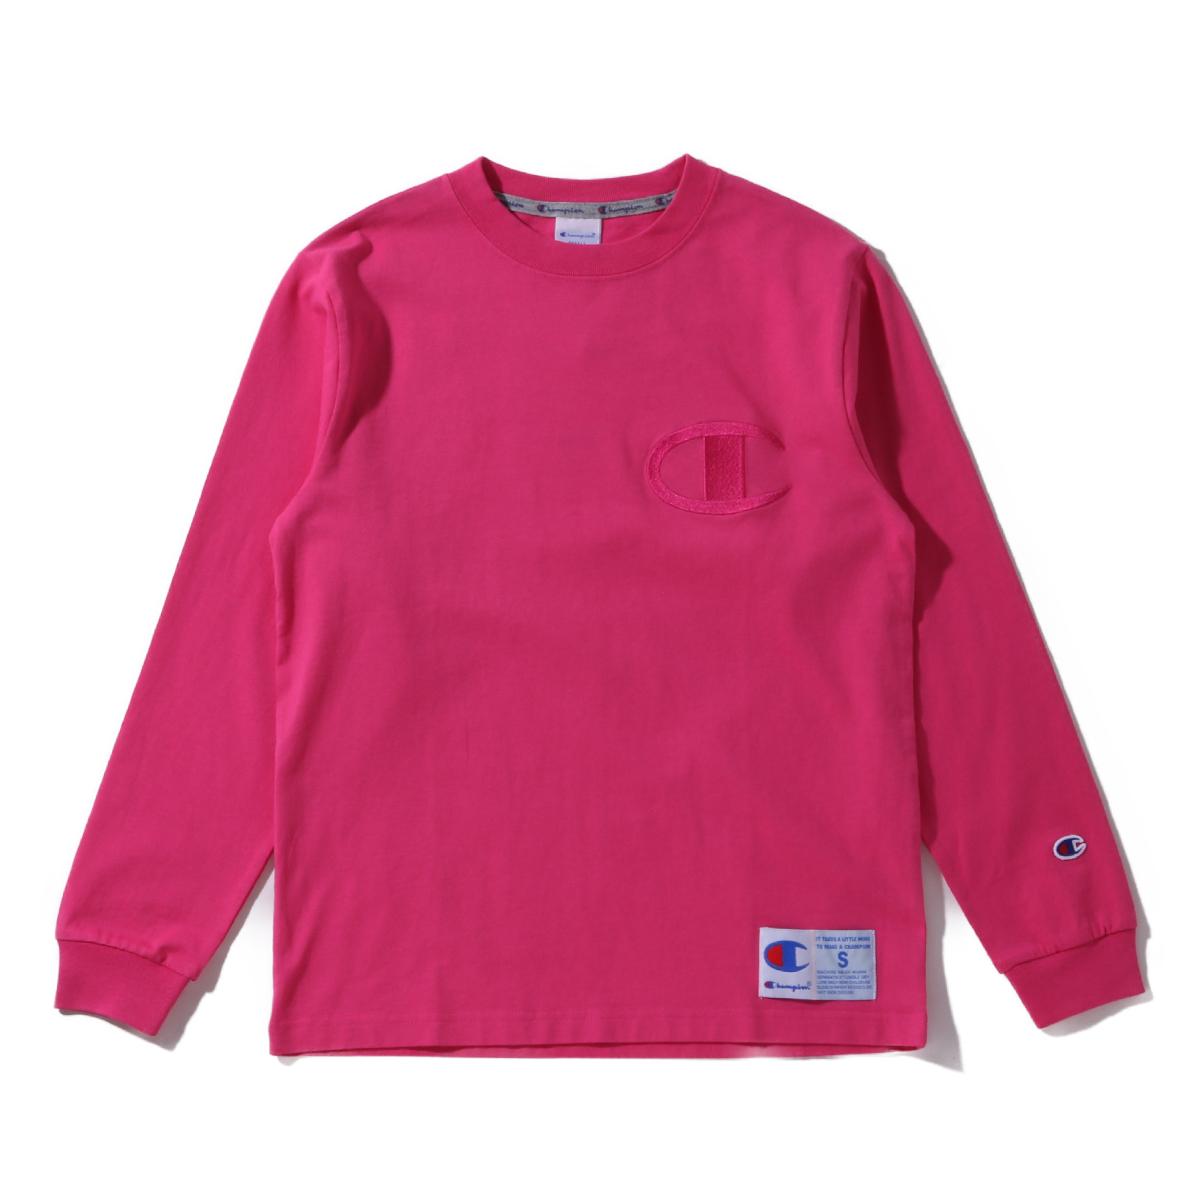 Champion LONG SLEEVE T-SHIRT(チャンピオン ロングスリーブ ティーシャツ)ネオピンク【メンズ 長袖Tシャツ】19FA-I